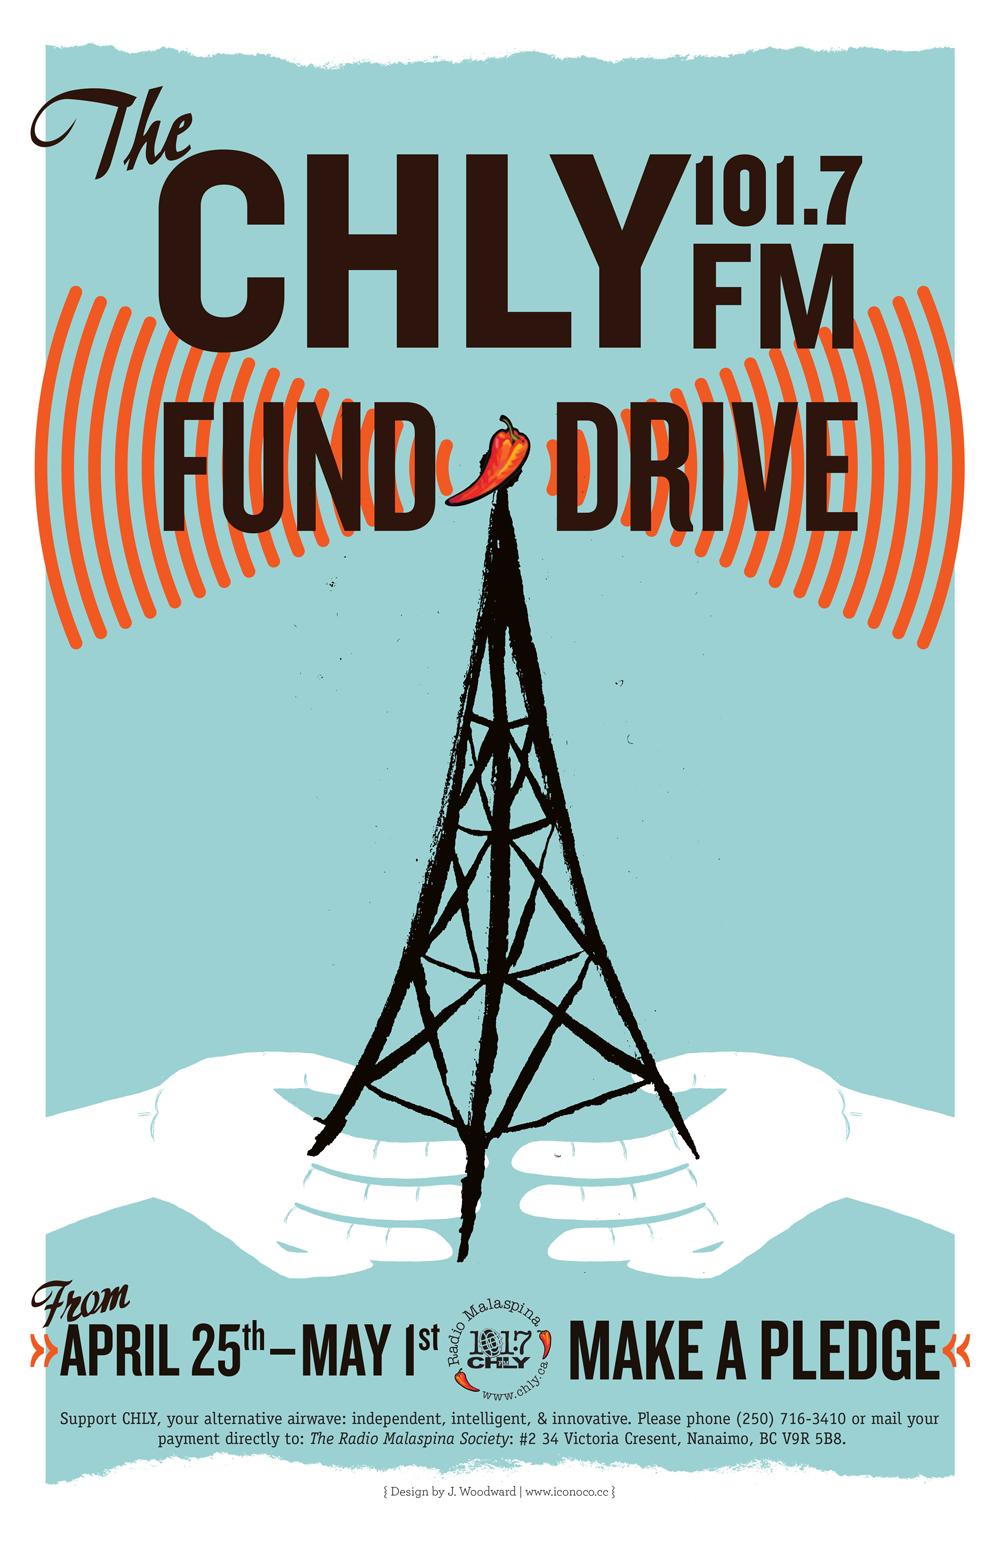 2010-CHLY-Fund-drive-11x17.jpg